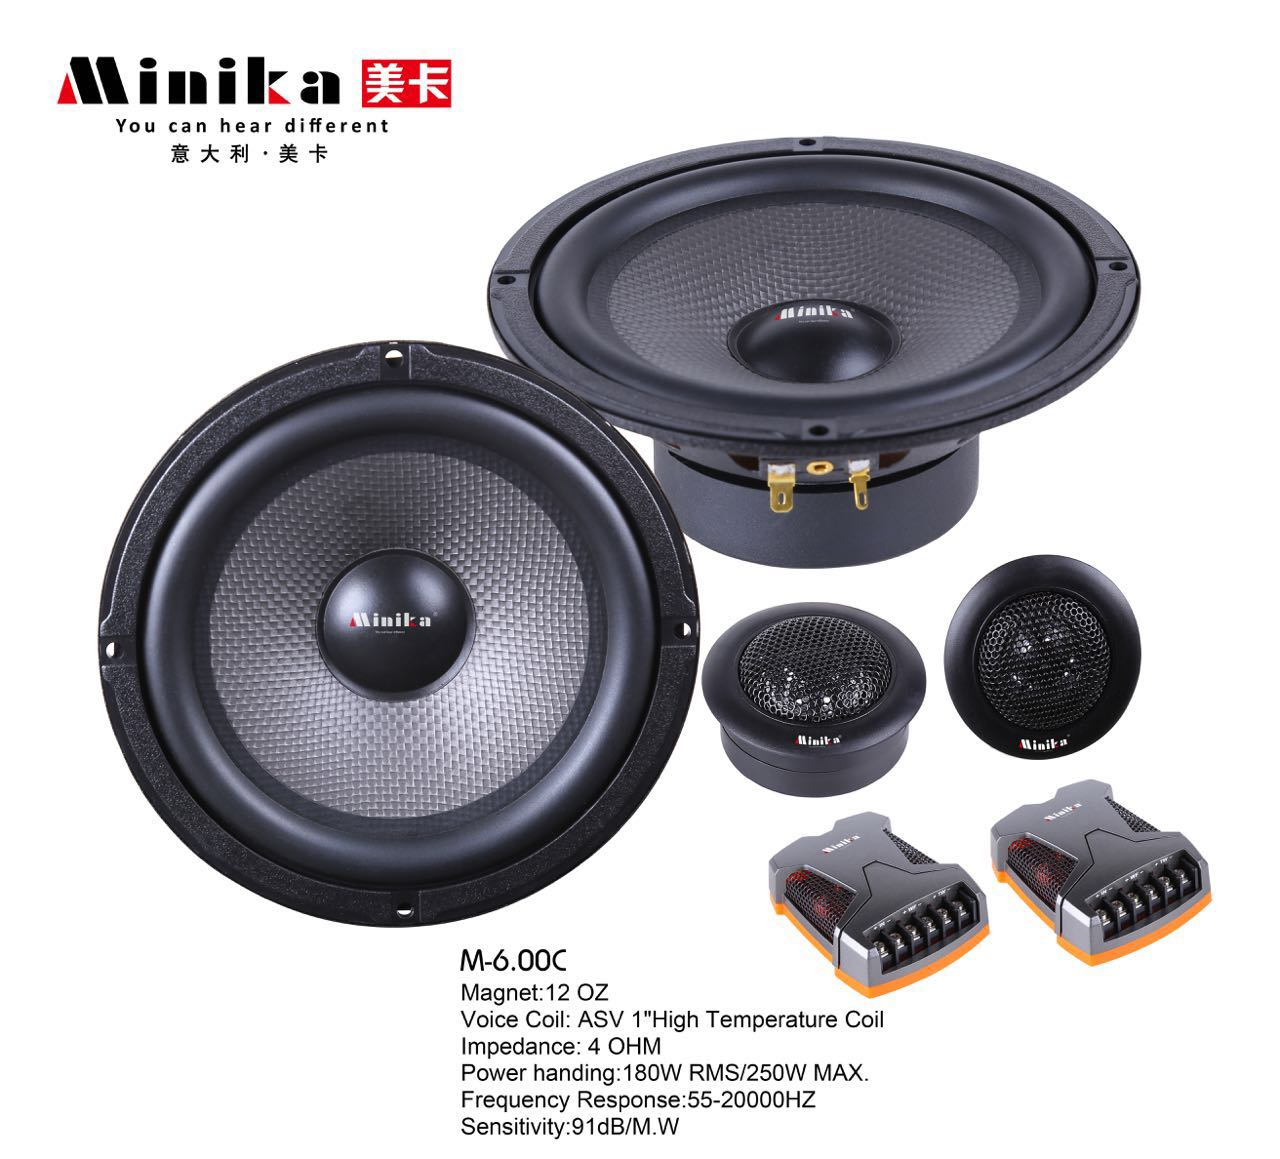 Minika 6 5 Inch Car Audio Speakers Sets 250W with Tweeter HIFI Car Speaker Set Coaxial